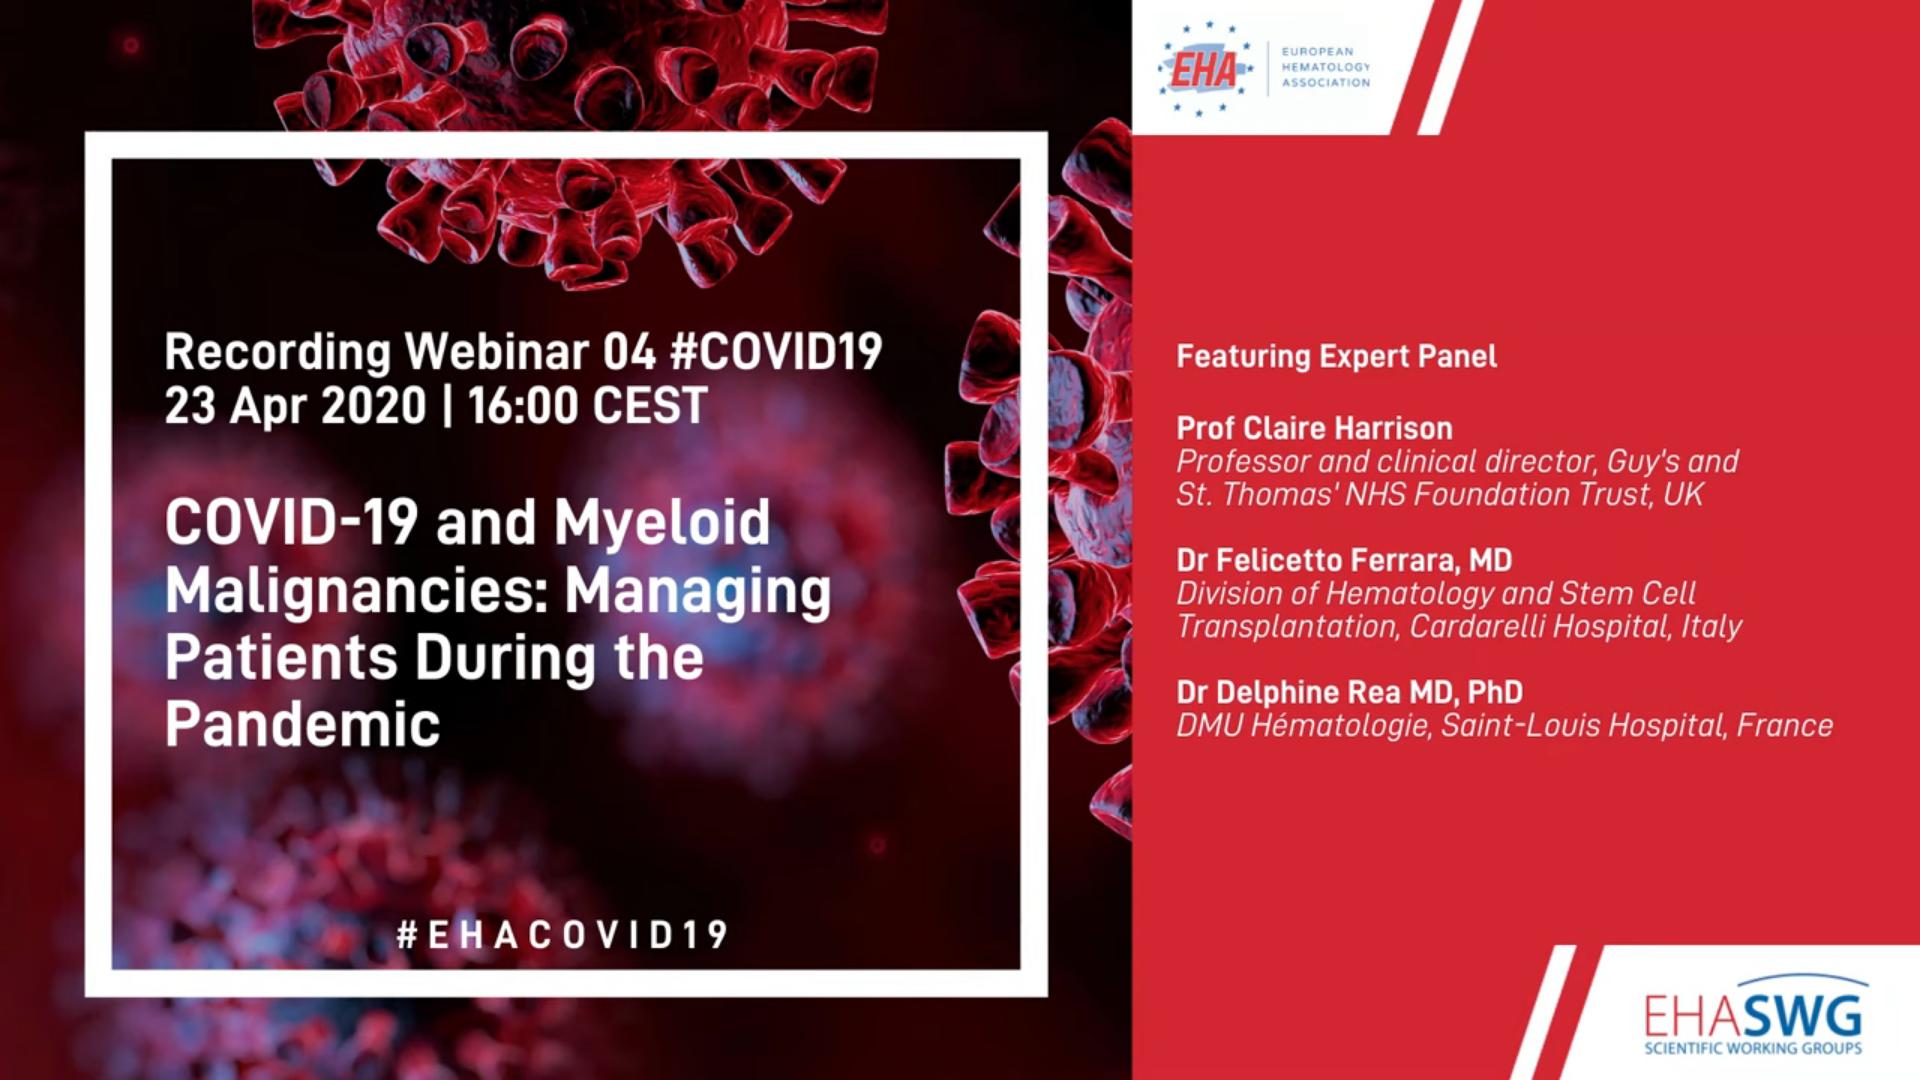 EHA/EHA-SWG Webinar: COVID-19 and myeloid malignancies: Managing patients during the pandemic